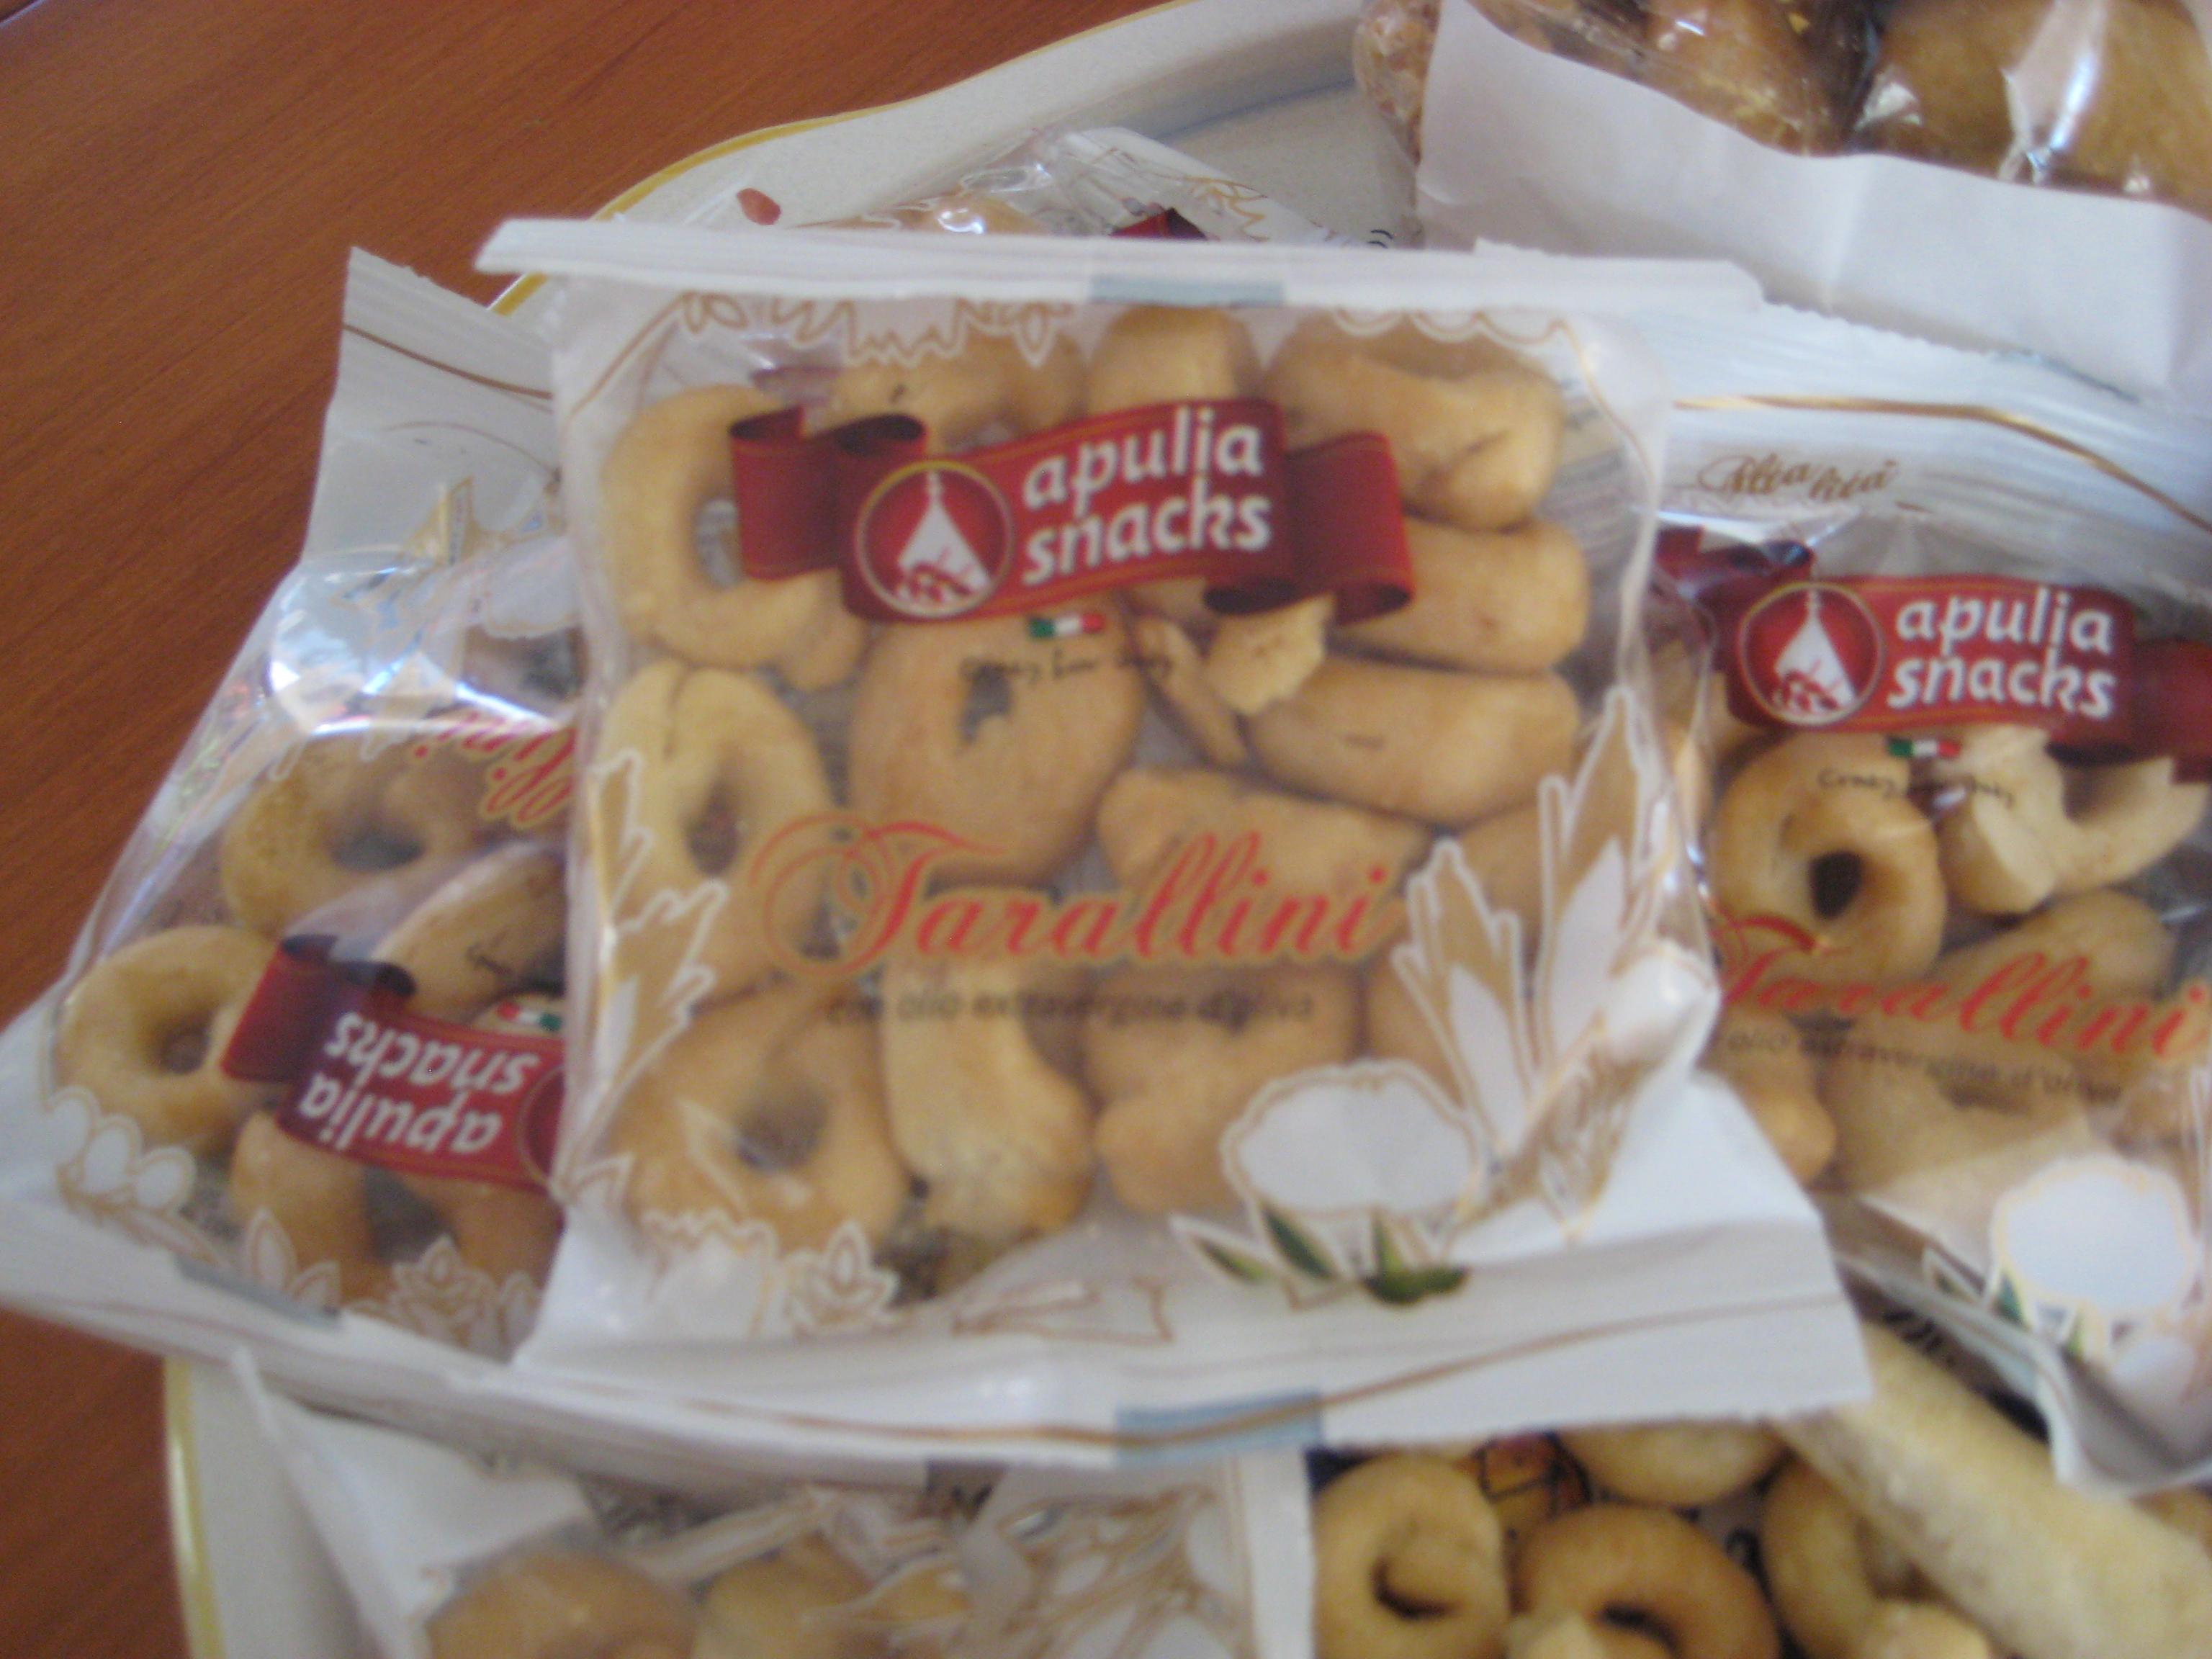 taralli-specialita-puglia-italian-crackers-snack-food-recipe